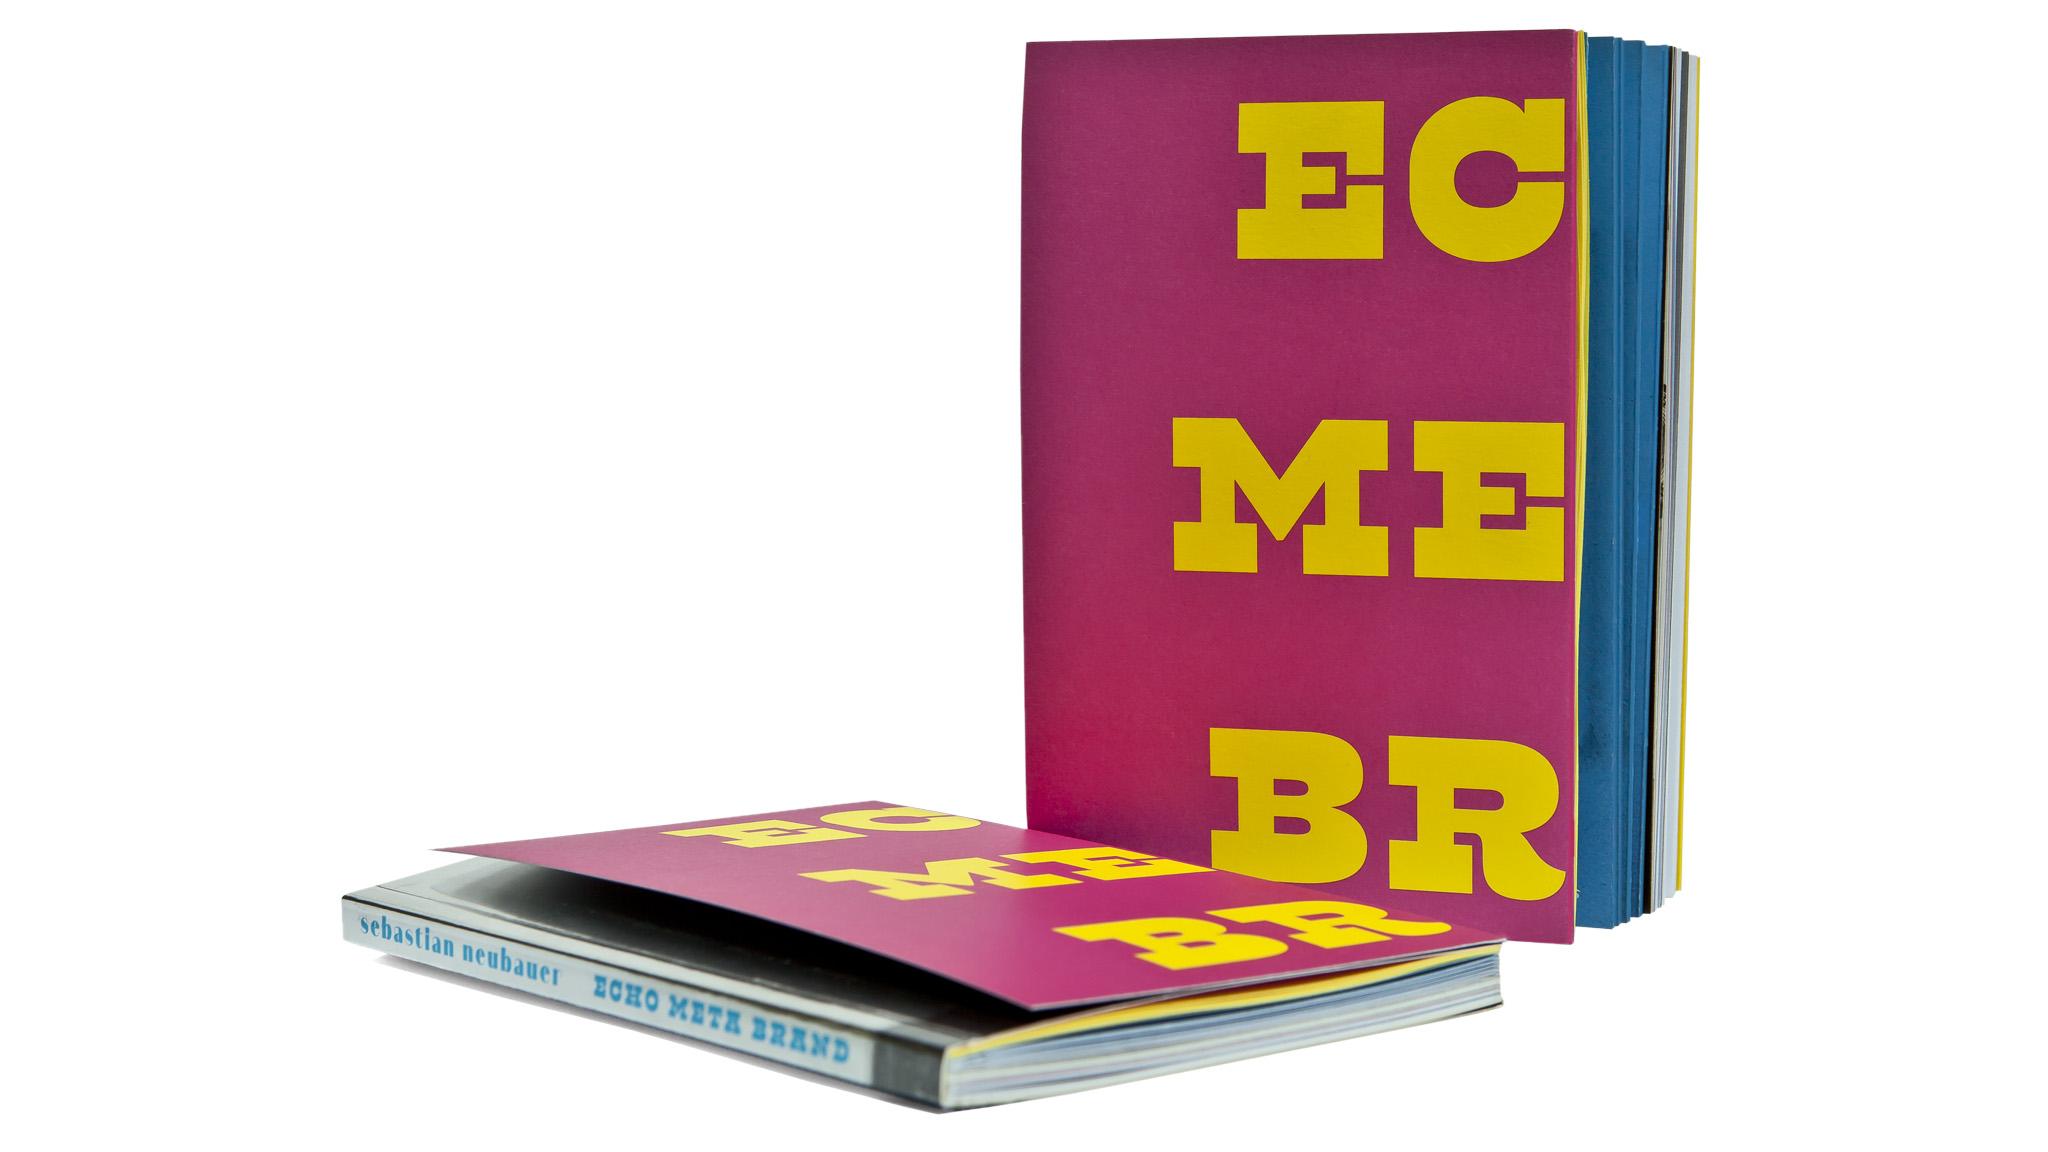 _ECHO META BRAND 2